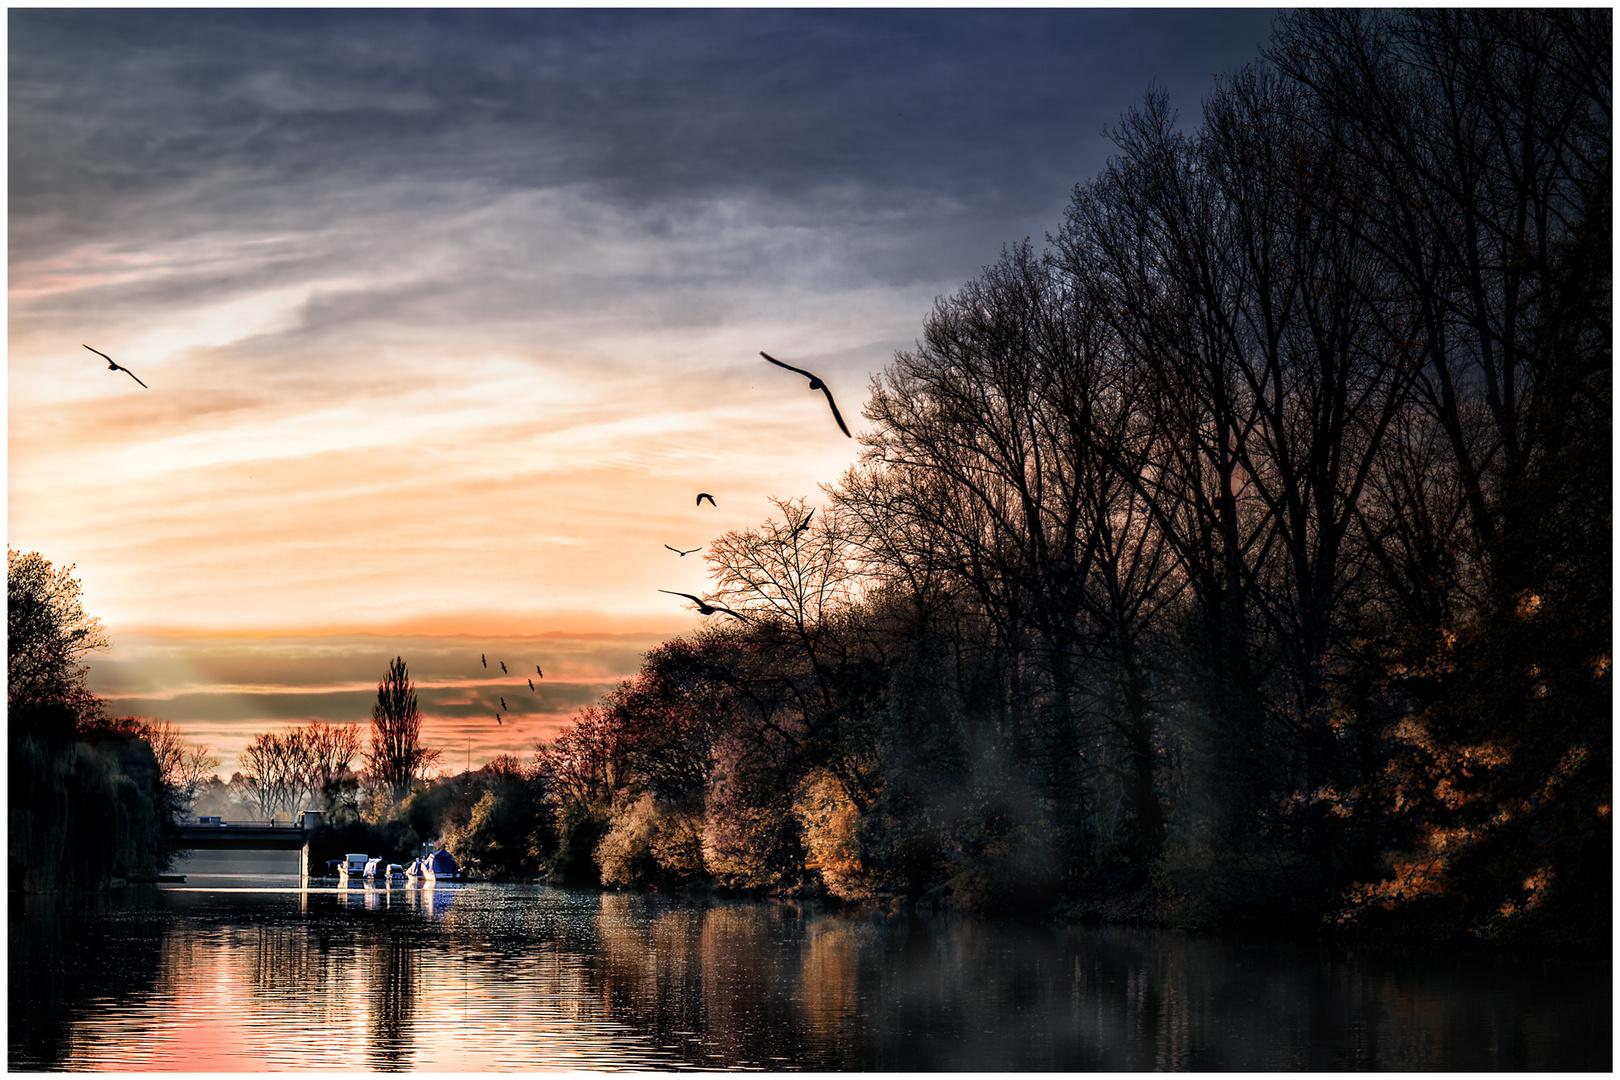 Neckar Idylle